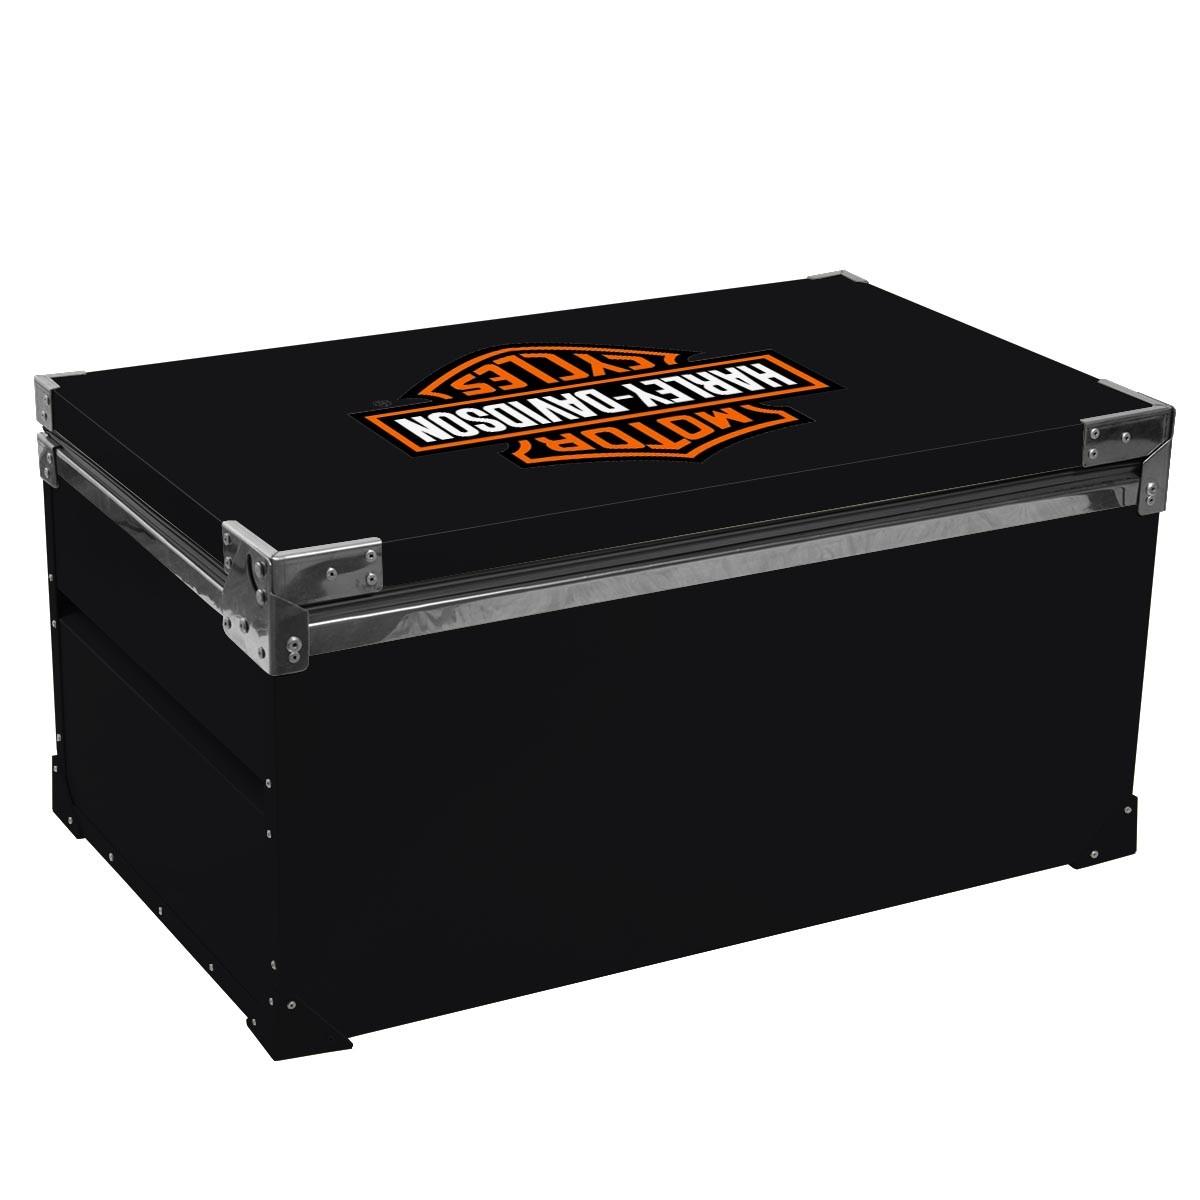 Caixa Térmica 110 Litros Harley Davidson